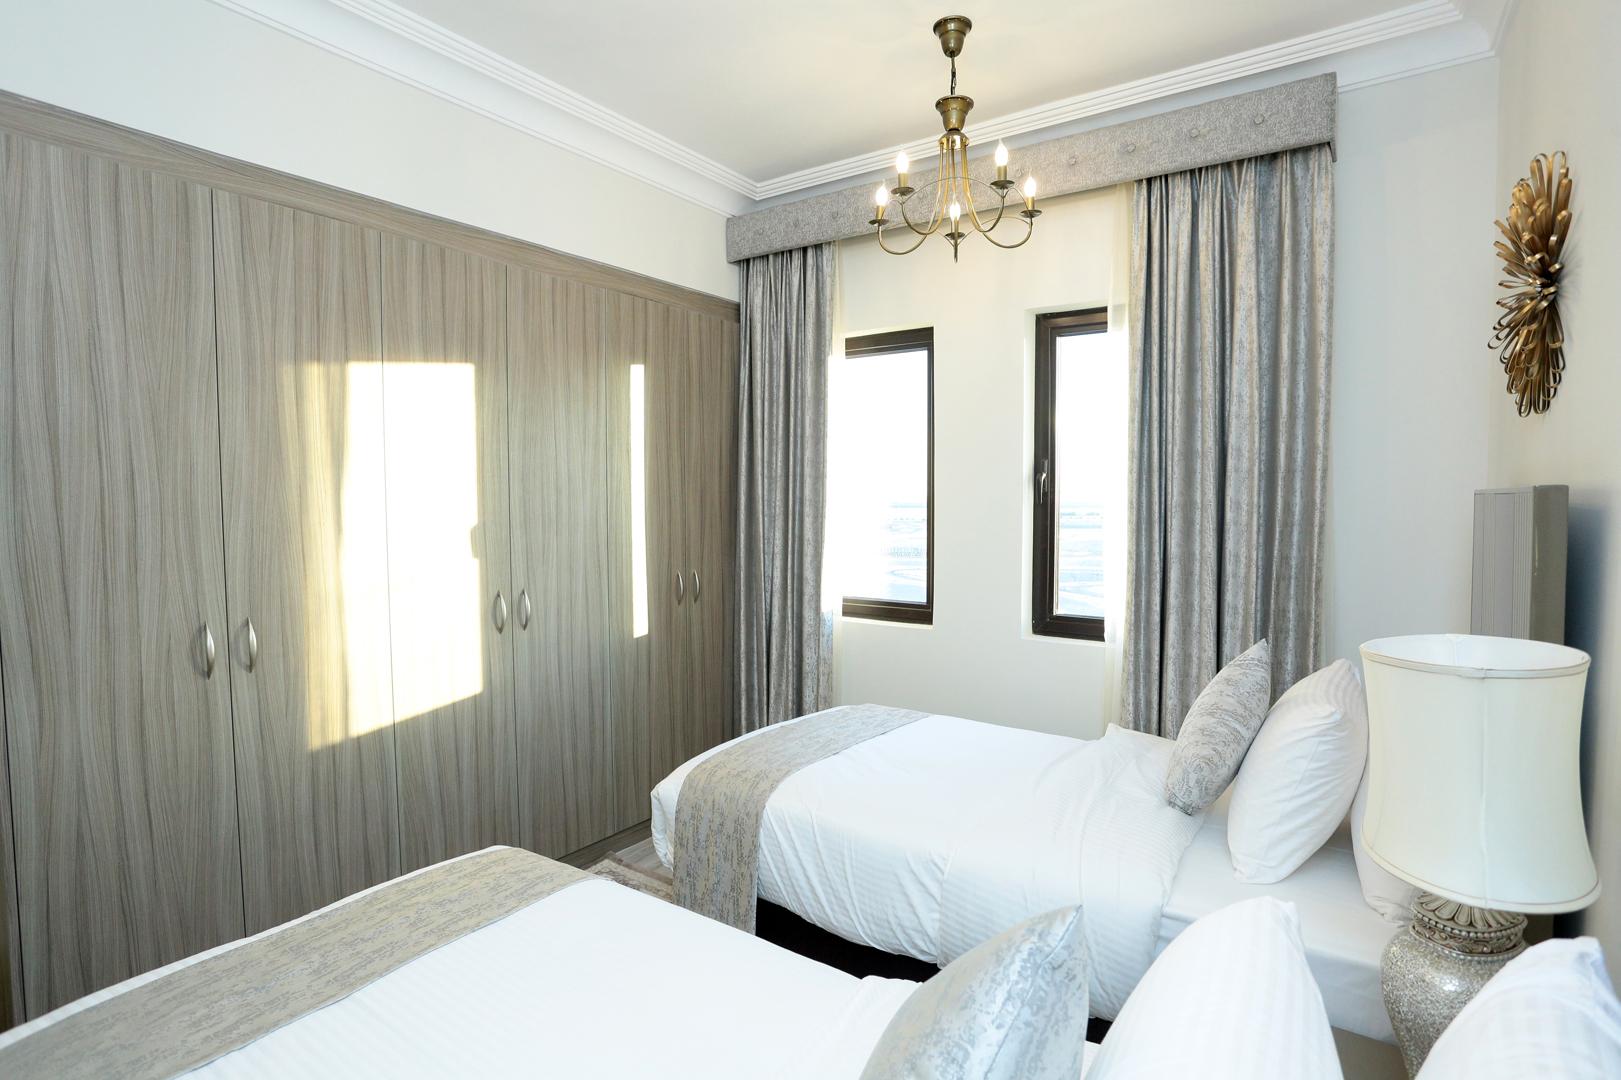 Marbella Luxury 2 bedrooms photo 27263081